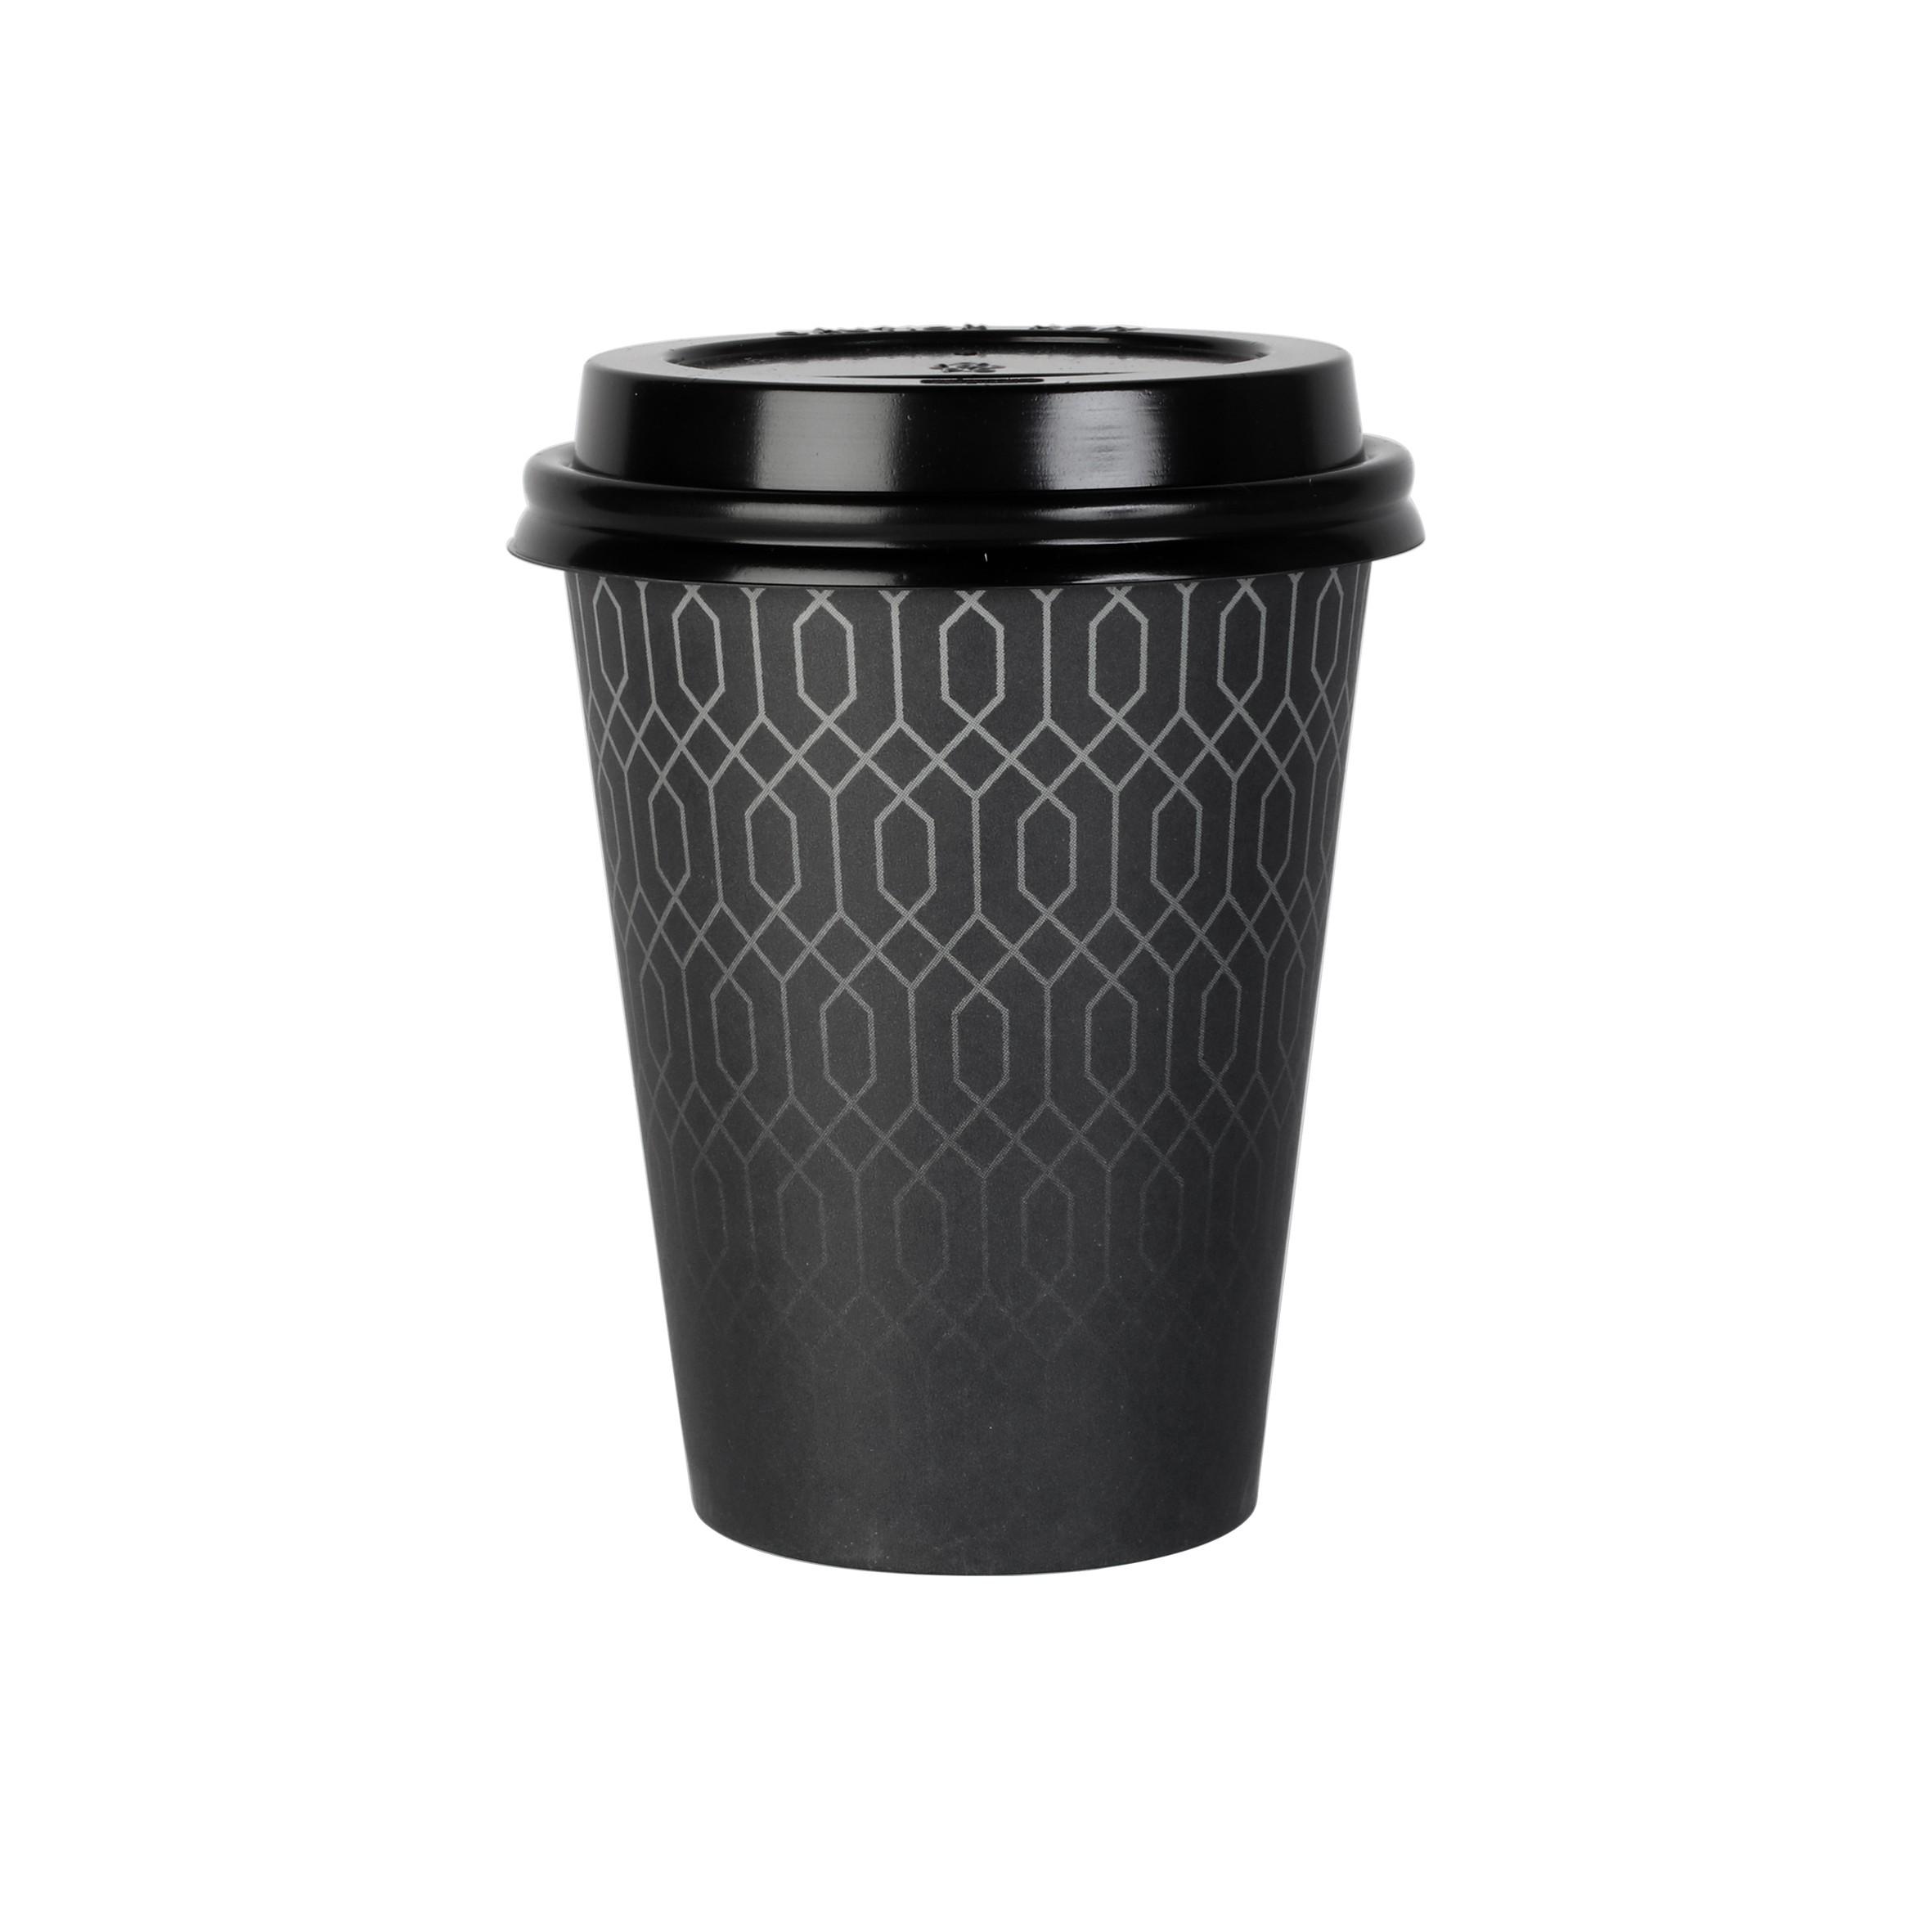 gobelet carton café jetable 35 cl avec couvercle